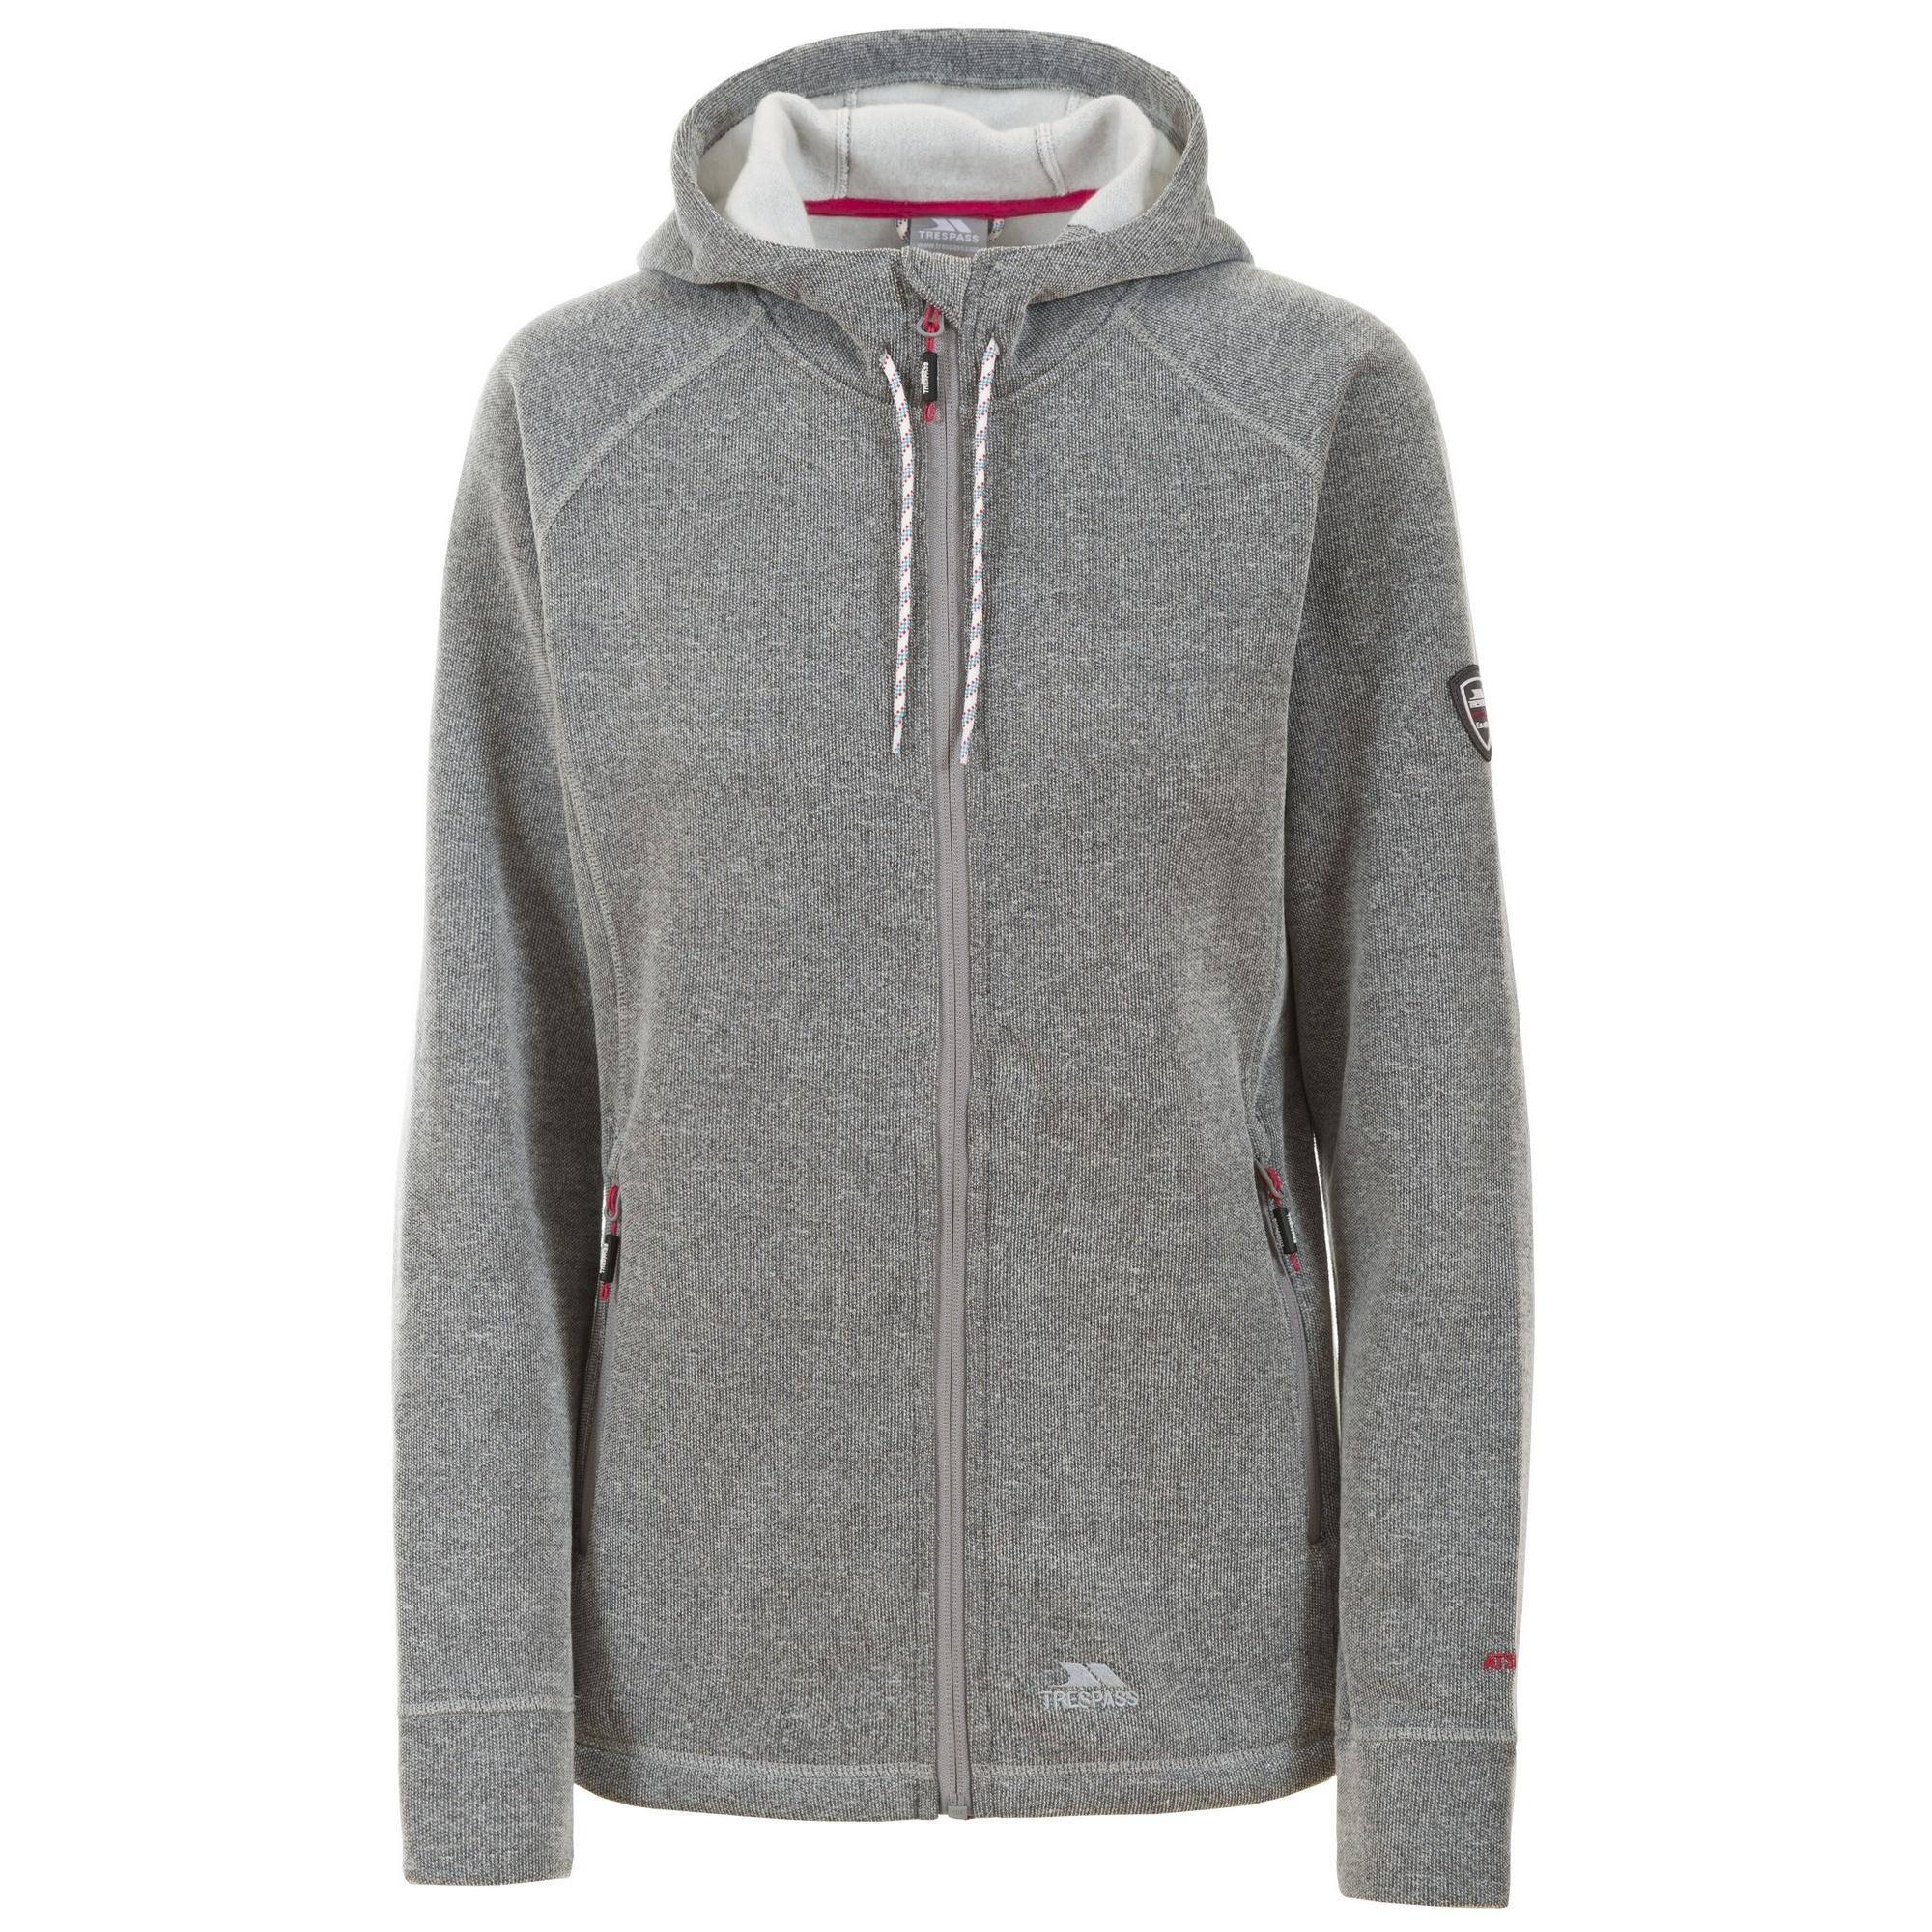 Trespass Womens/Ladies Whirlwind Full Zip Hooded Fleece Jacket (XS) (Grey Marl)